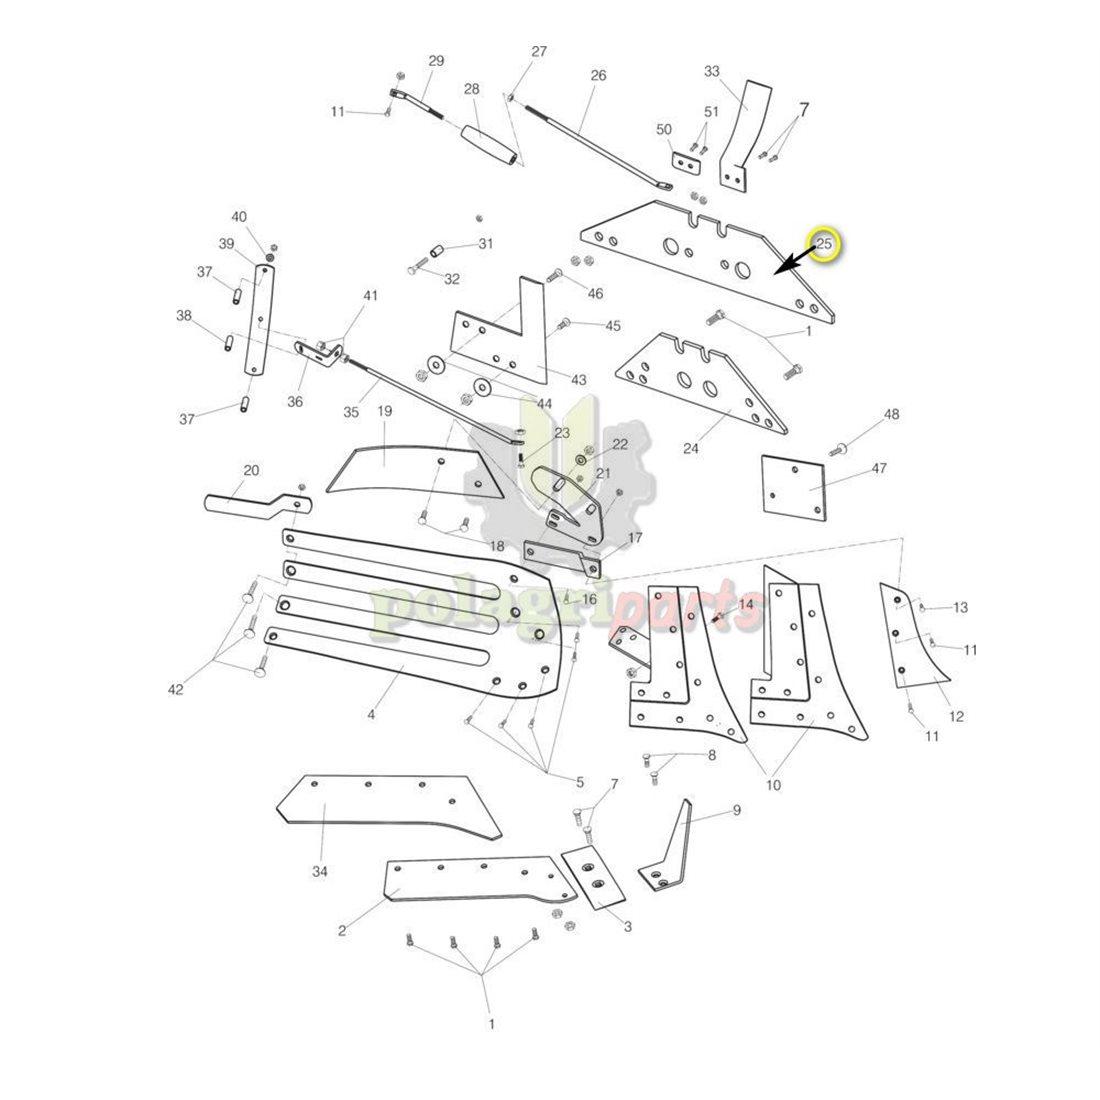 Płoza długa obracalna Kverneland 073609 prawa i lewa